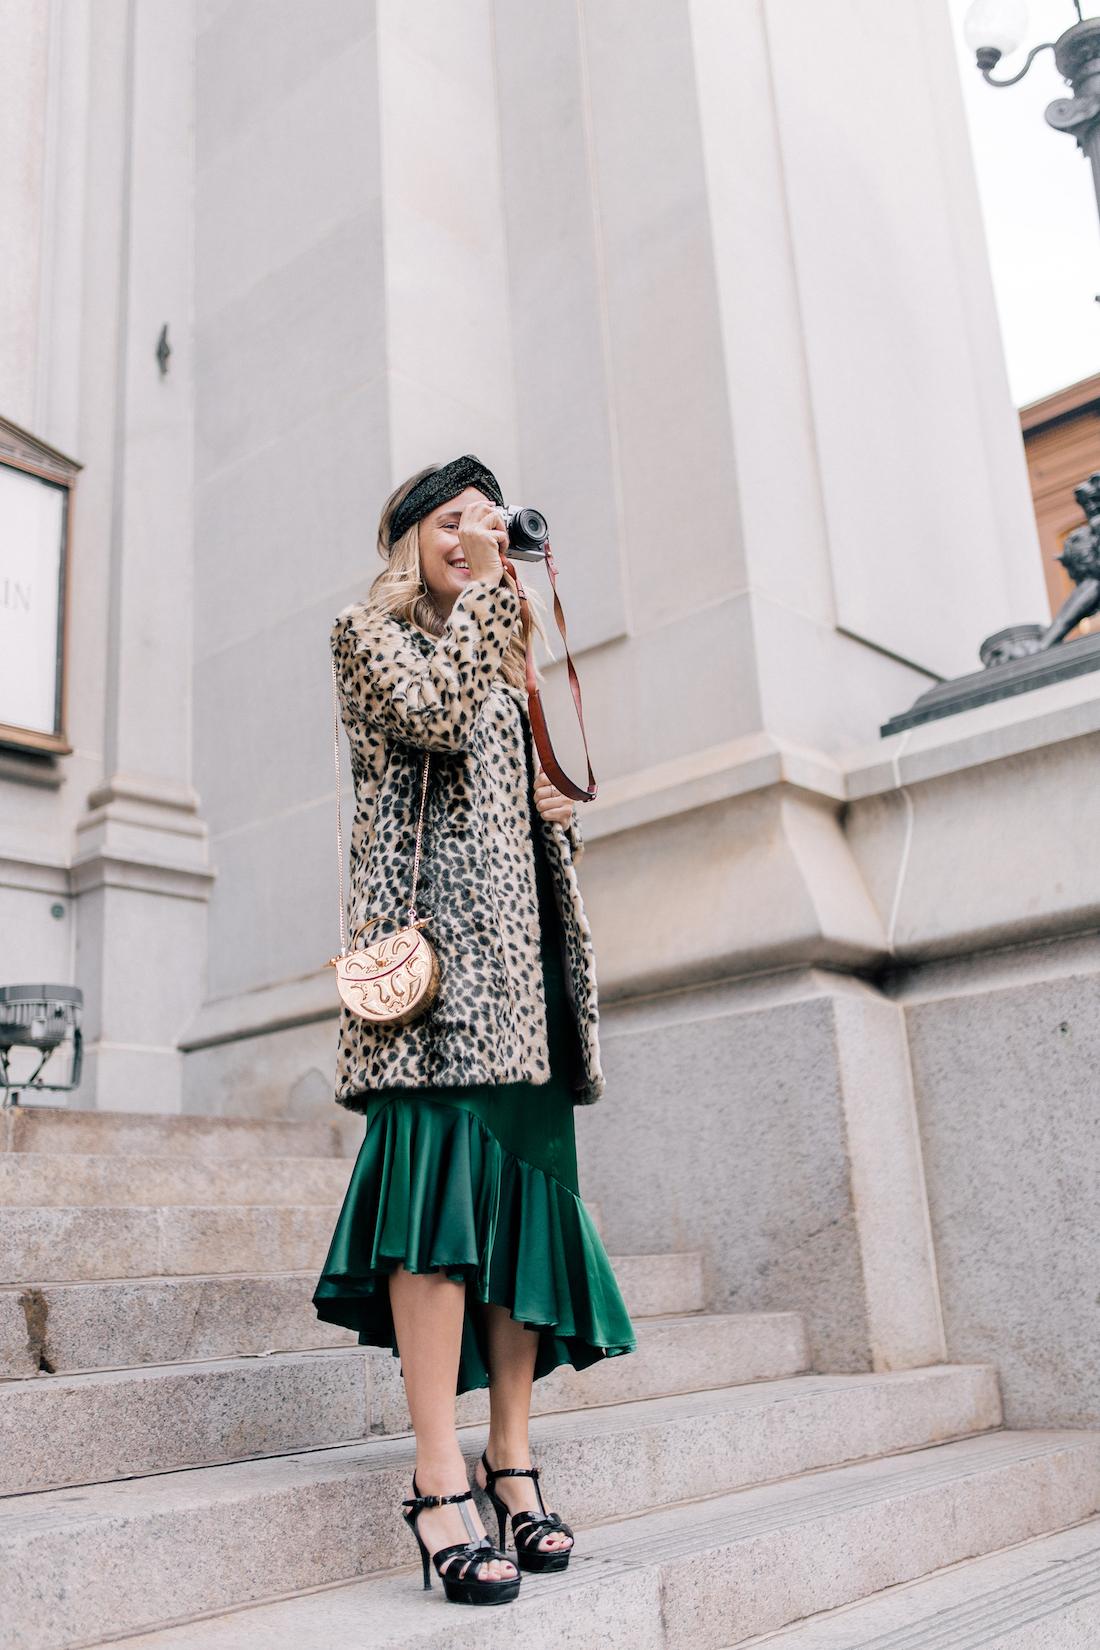 Outfit Details: Viva Aviva Dress c/o// Animal Print Coat // Zara Sparkly Headband! // Saint Laurent Tribute Sandals // Okhtein Bag - The Stripe